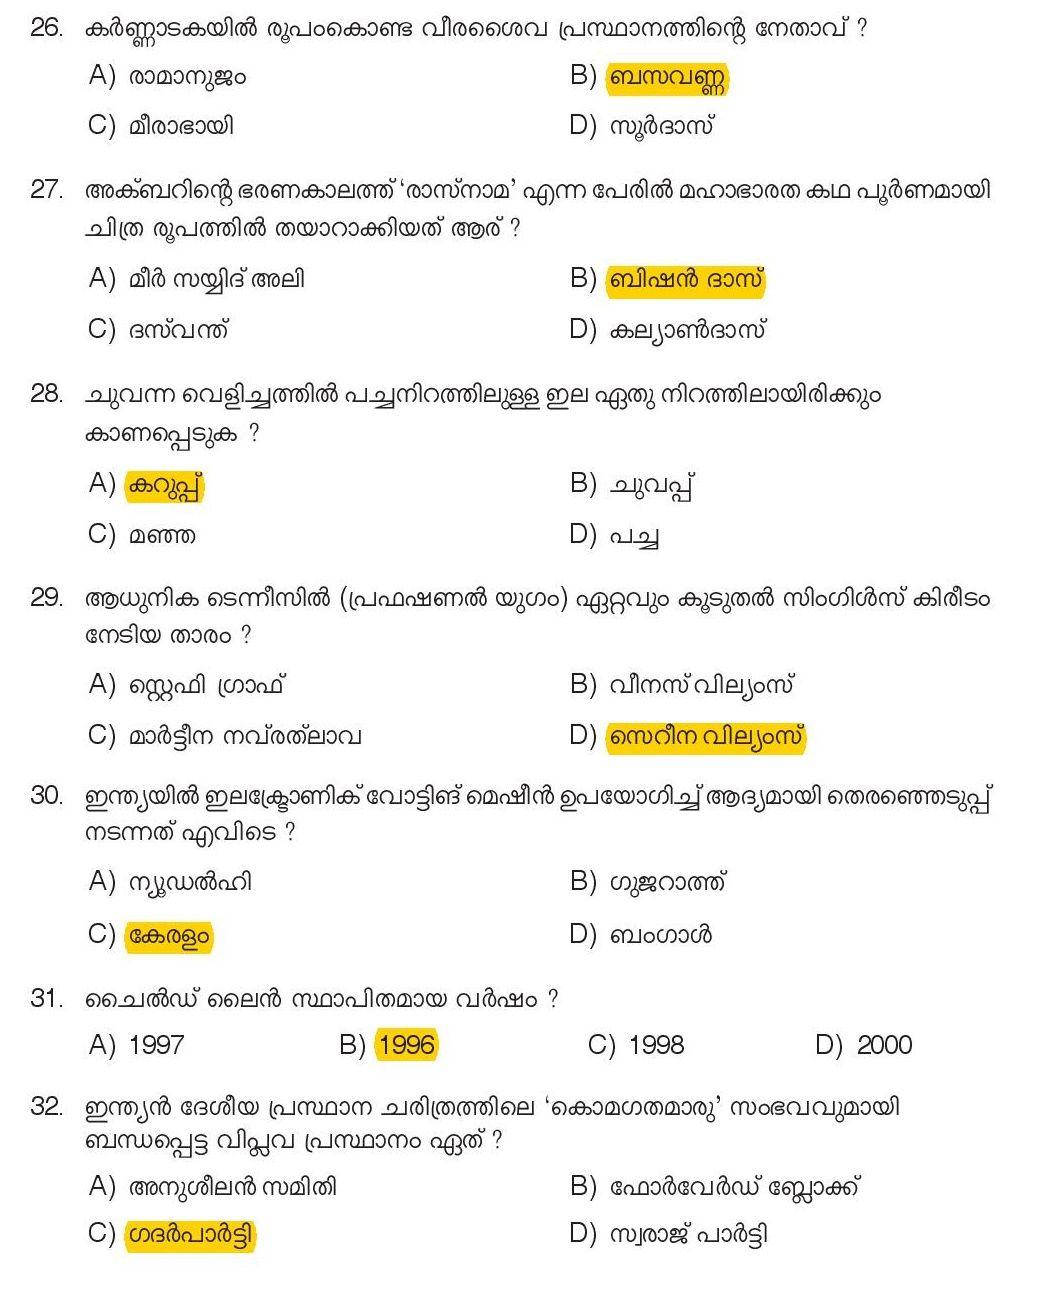 Kerala Psc Police Constable Question Paper Pdf